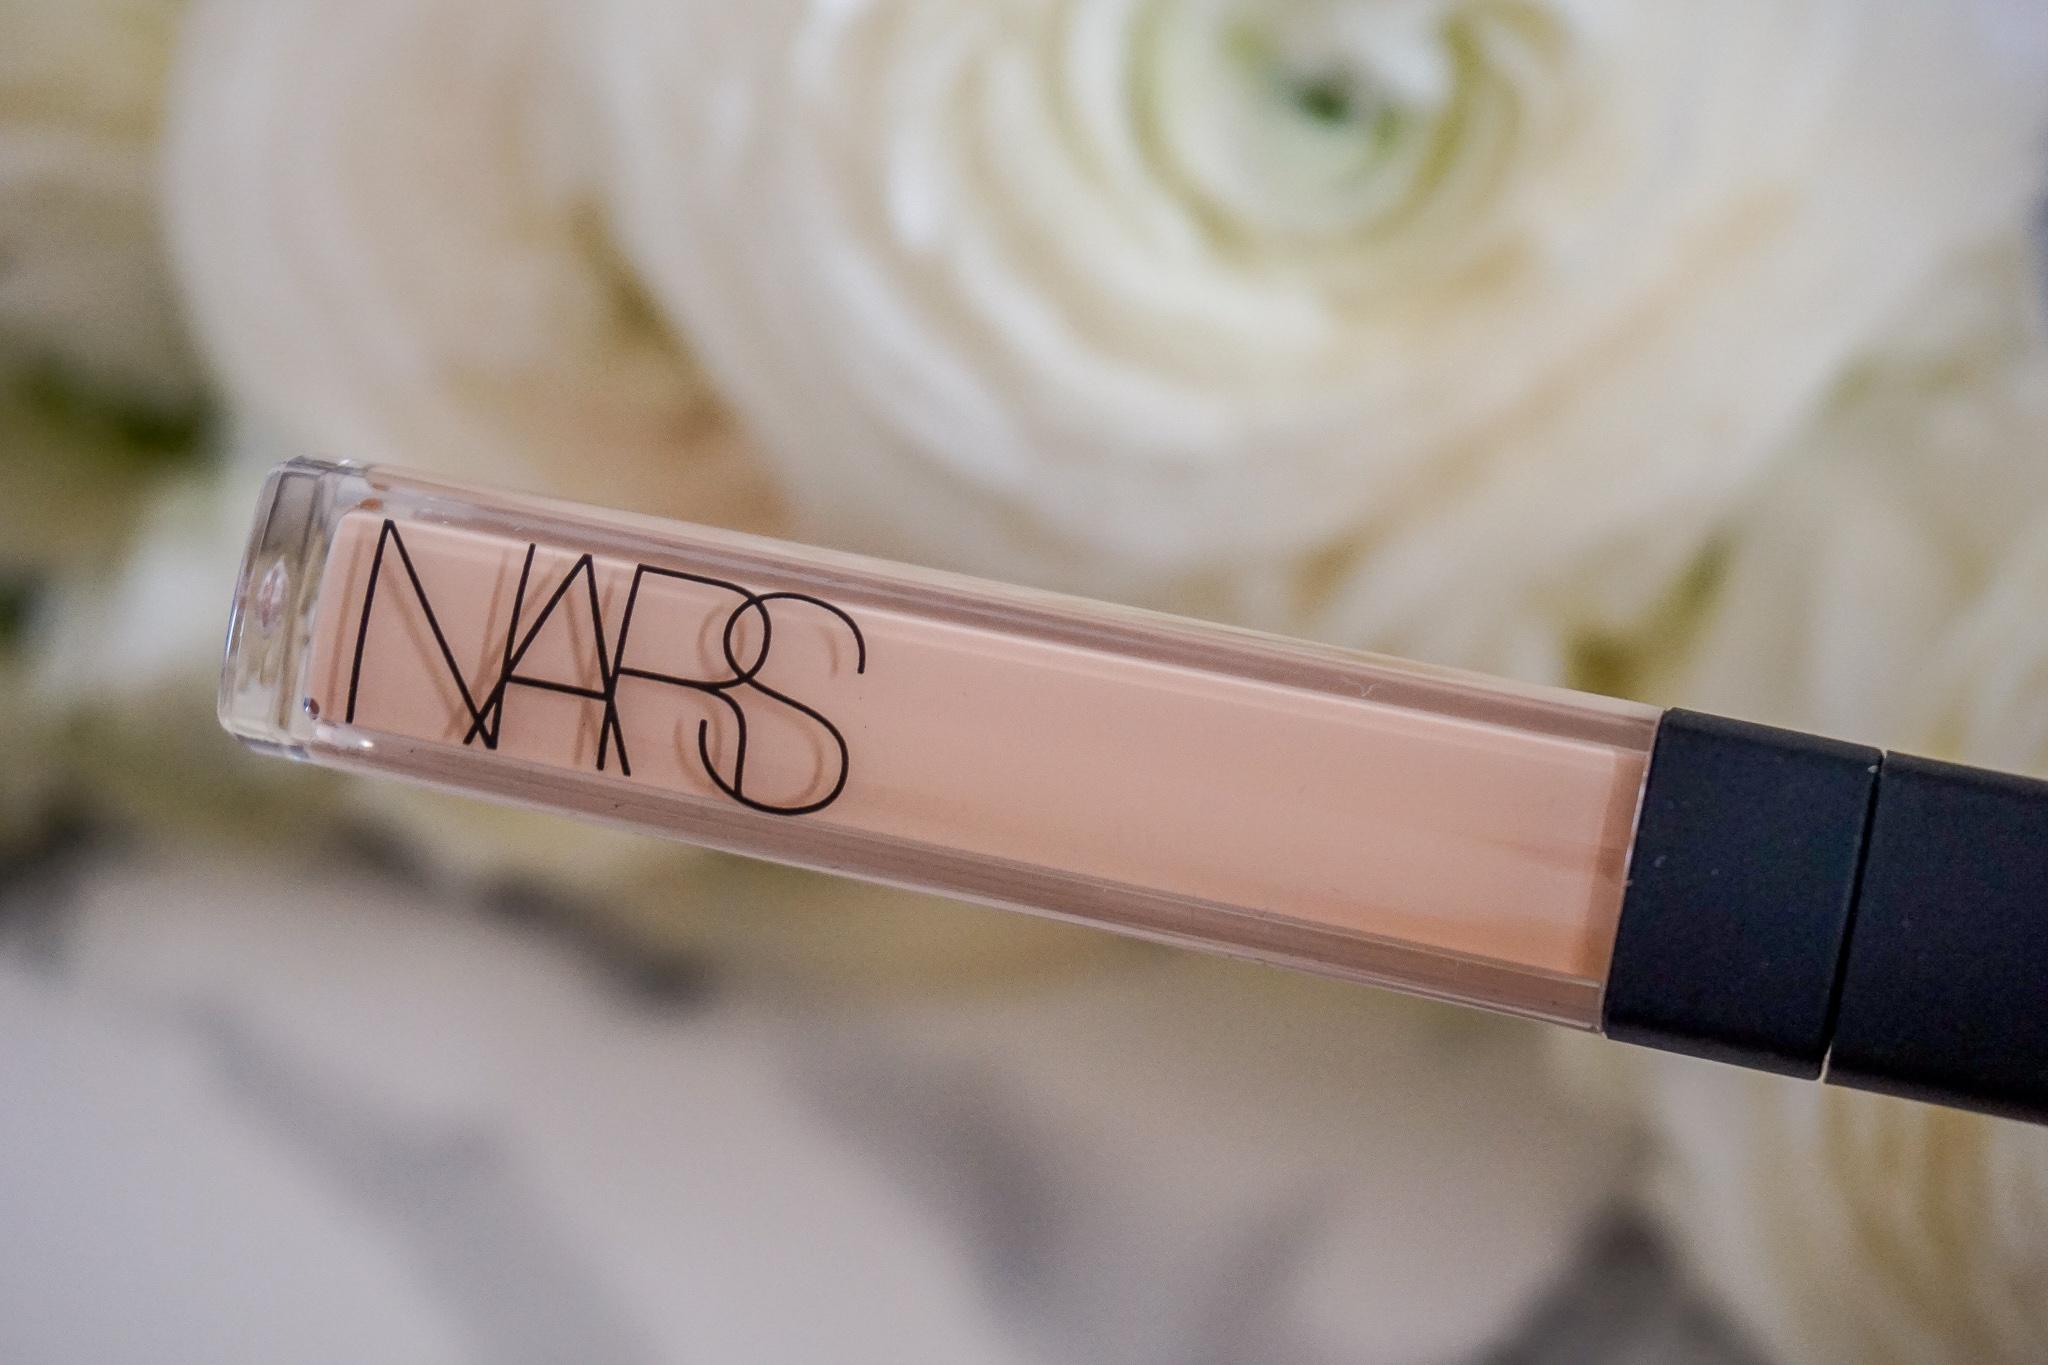 NARS - Radiant Creamy Concealer